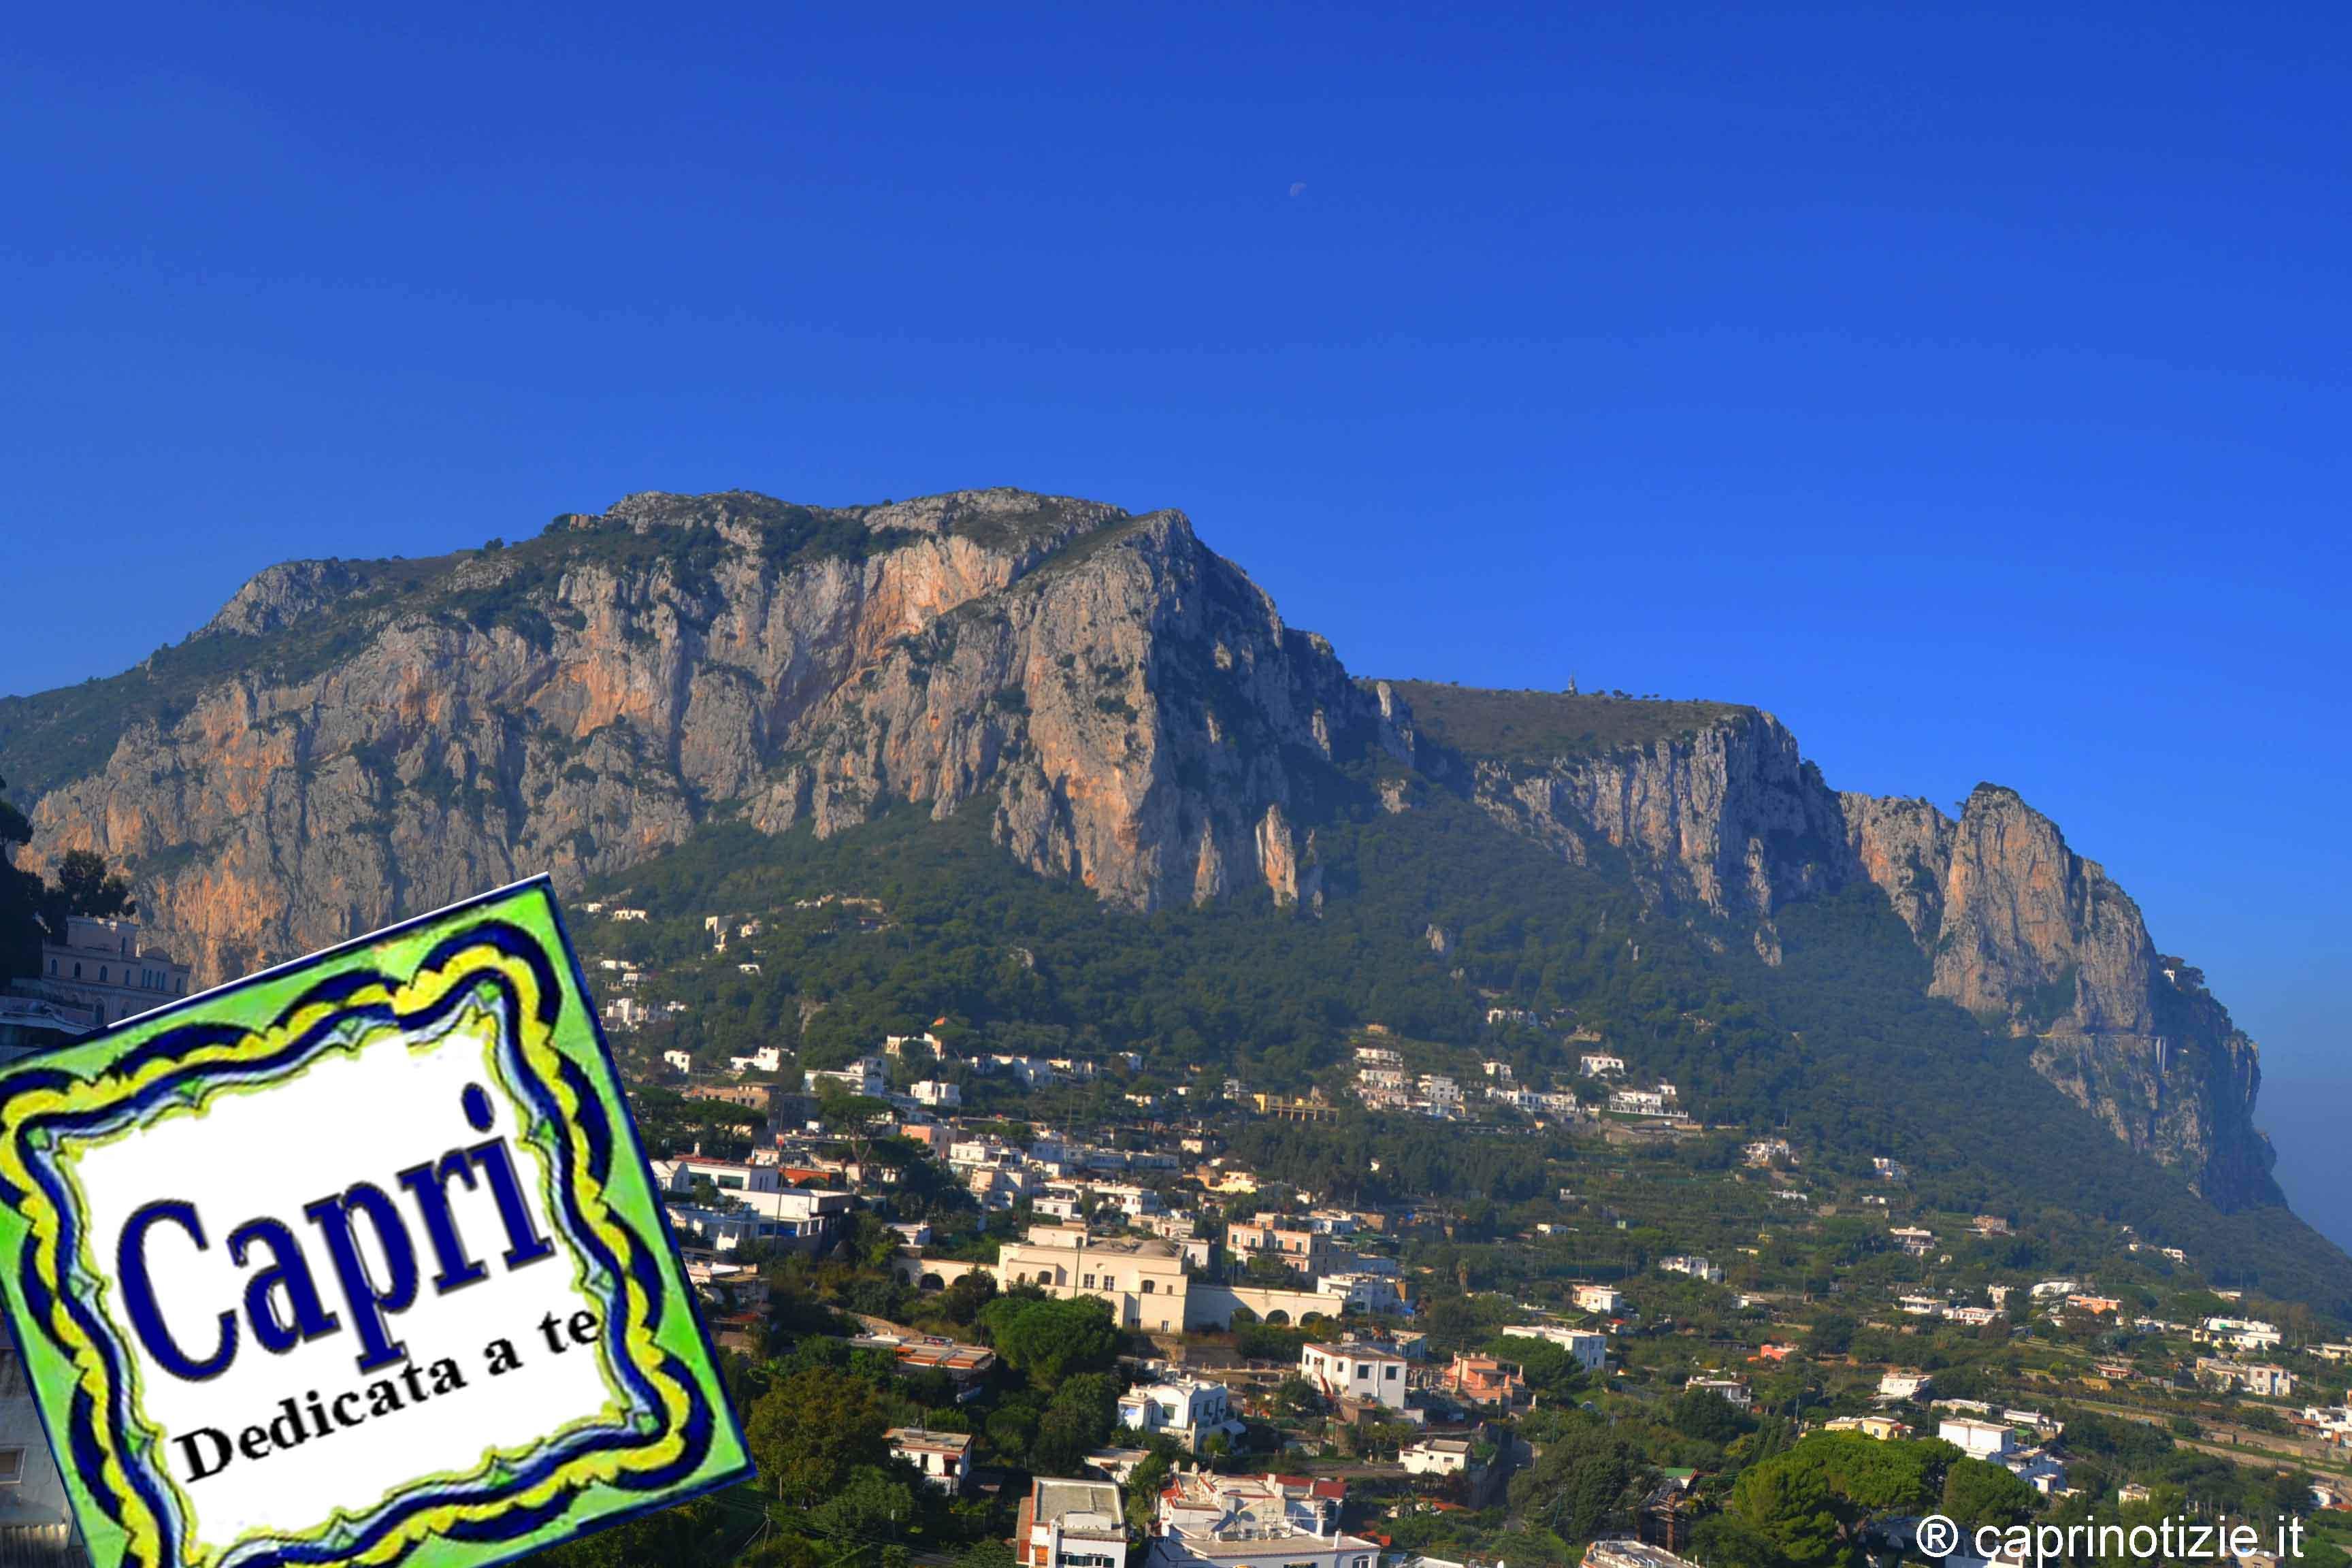 Capri: le 5 foto piu' cliccate del 2013 (da scaricare gratis)